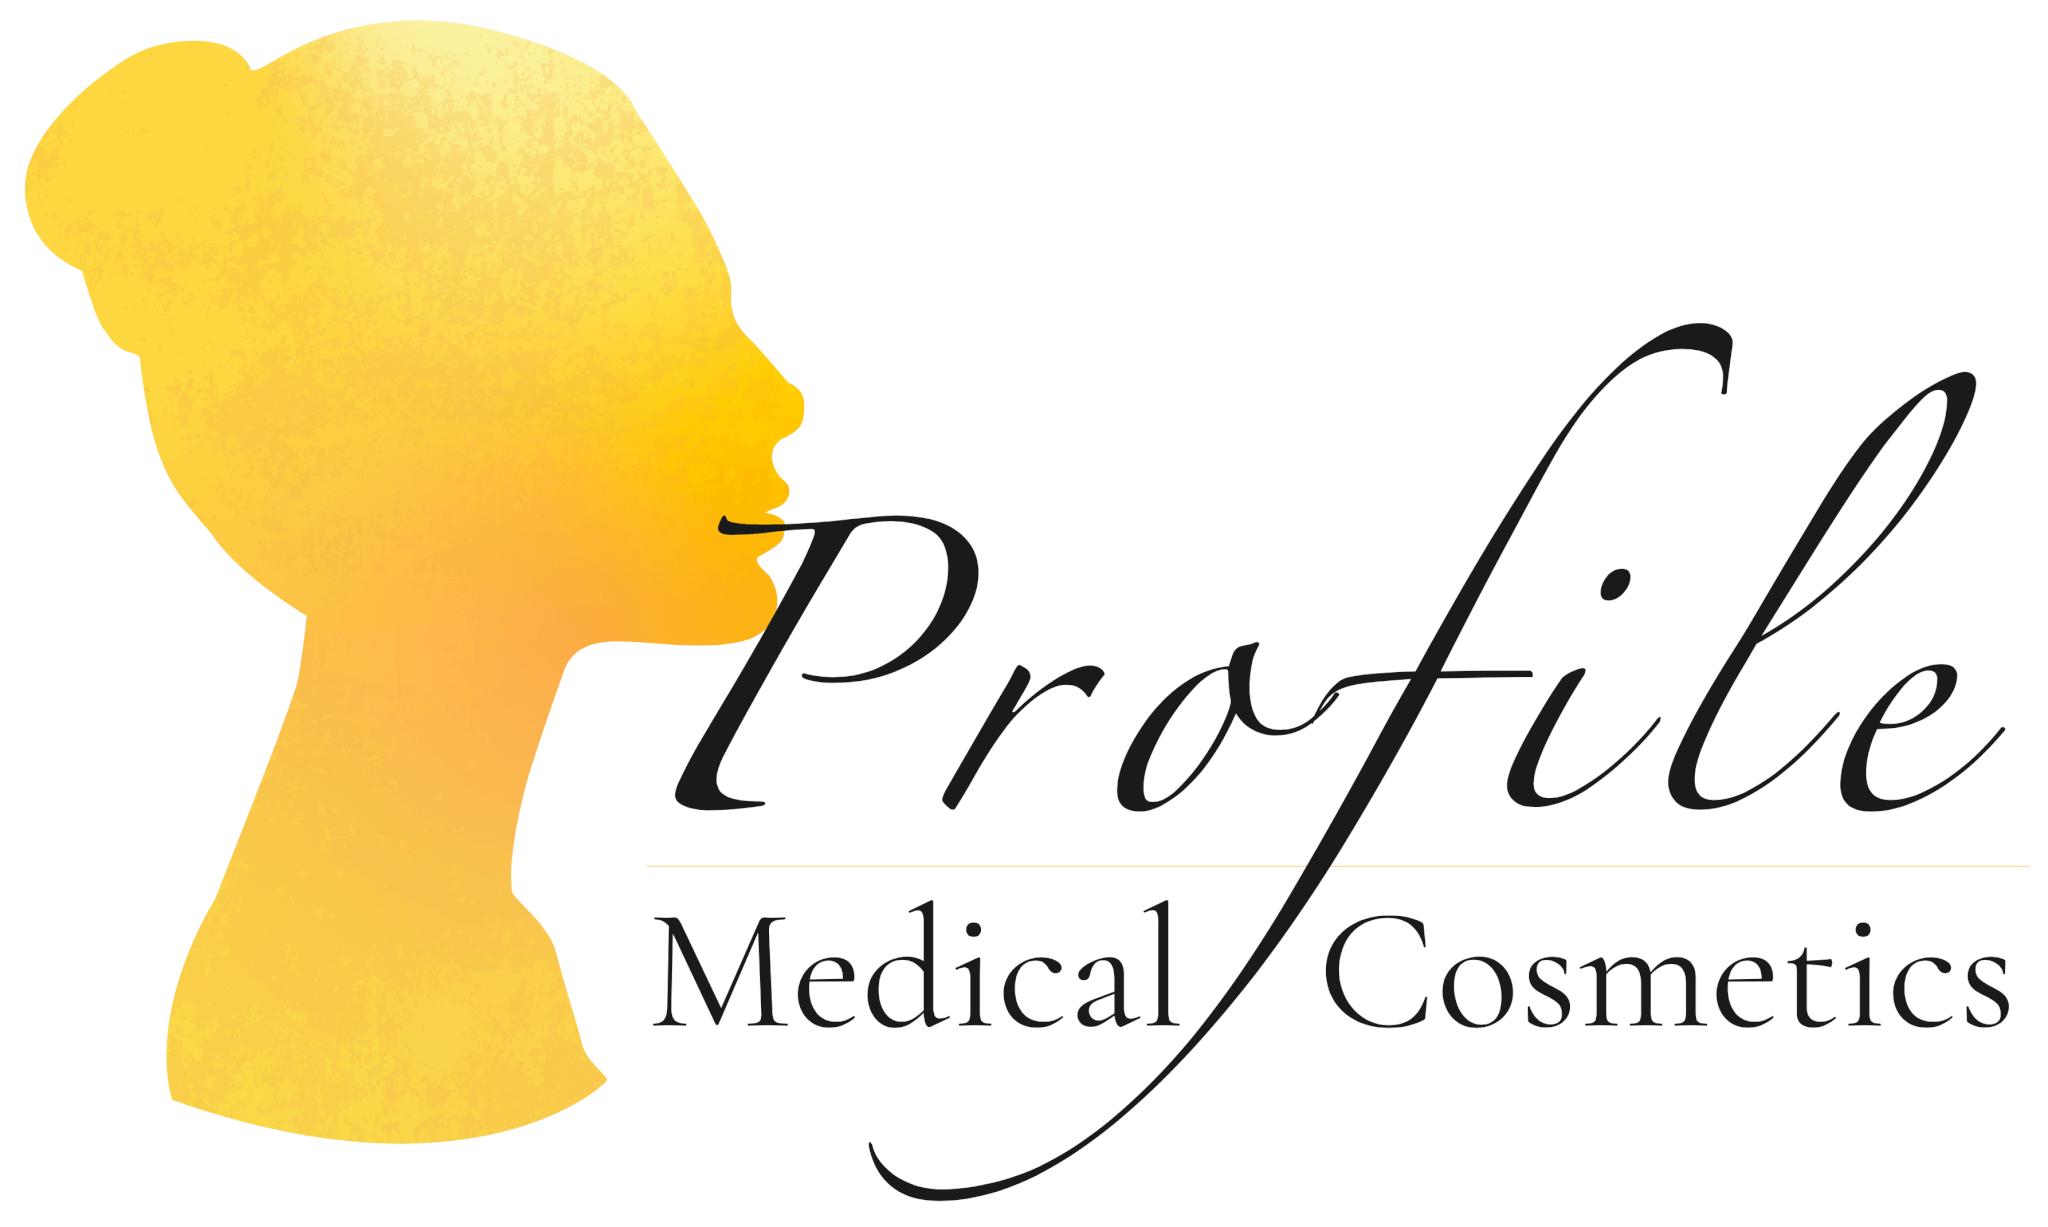 medical cosmetics logo design